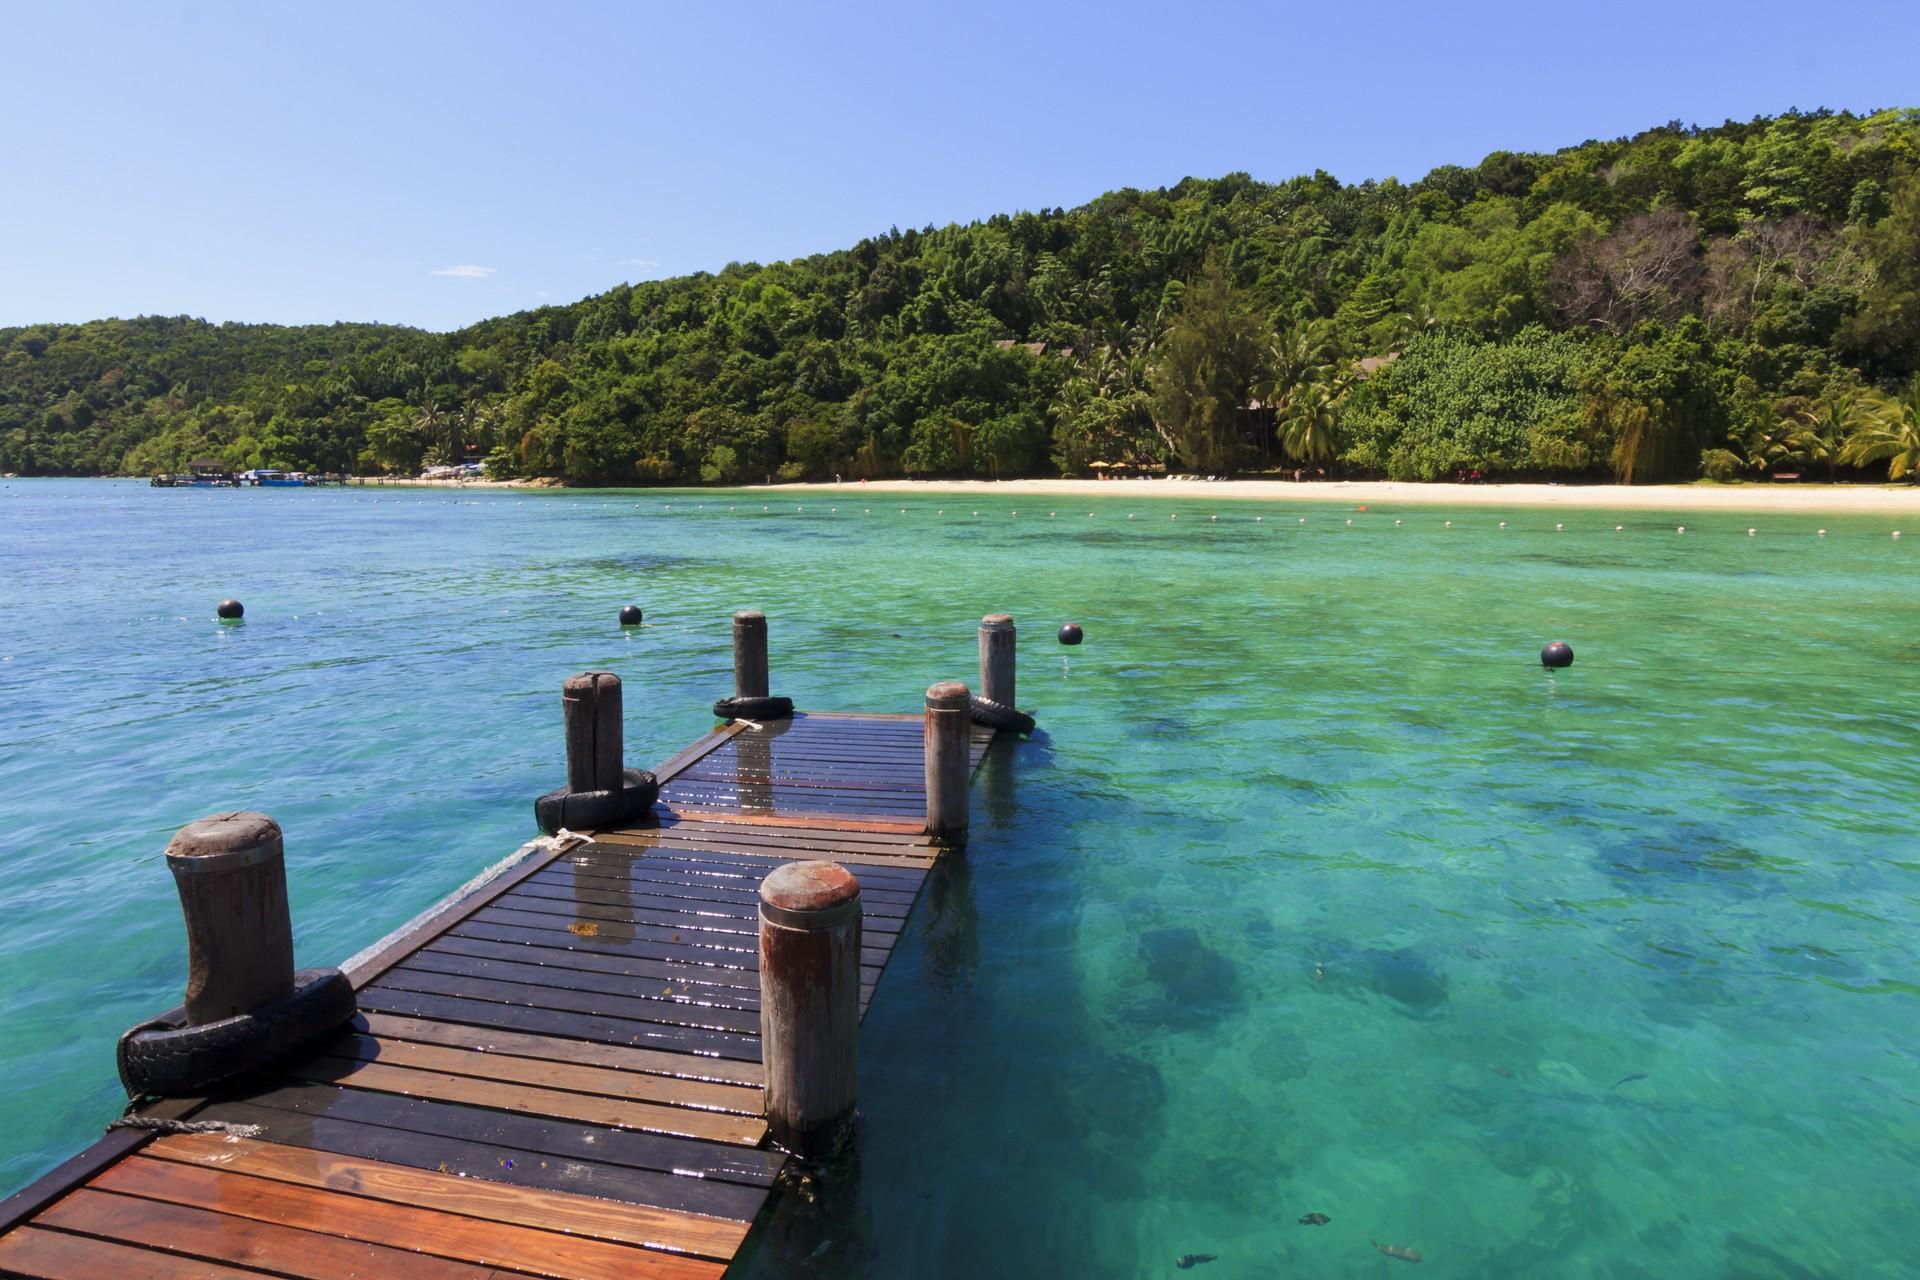 Borneo holidays: Manukan island